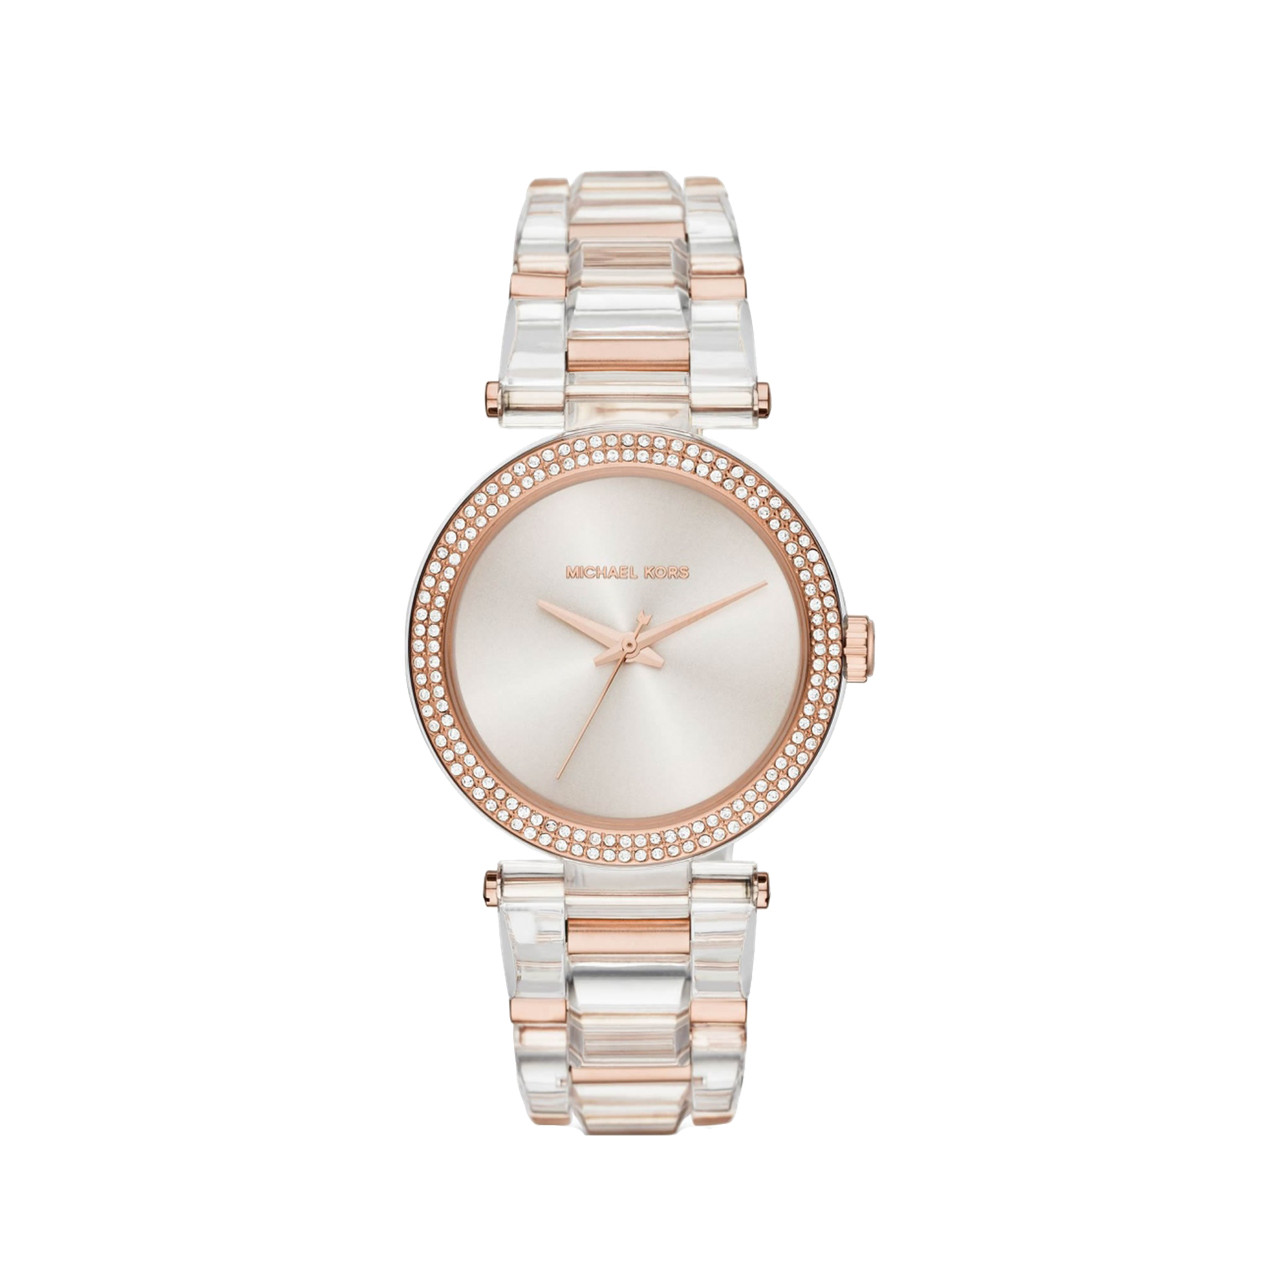 Женские часы Michael Kors MK4318